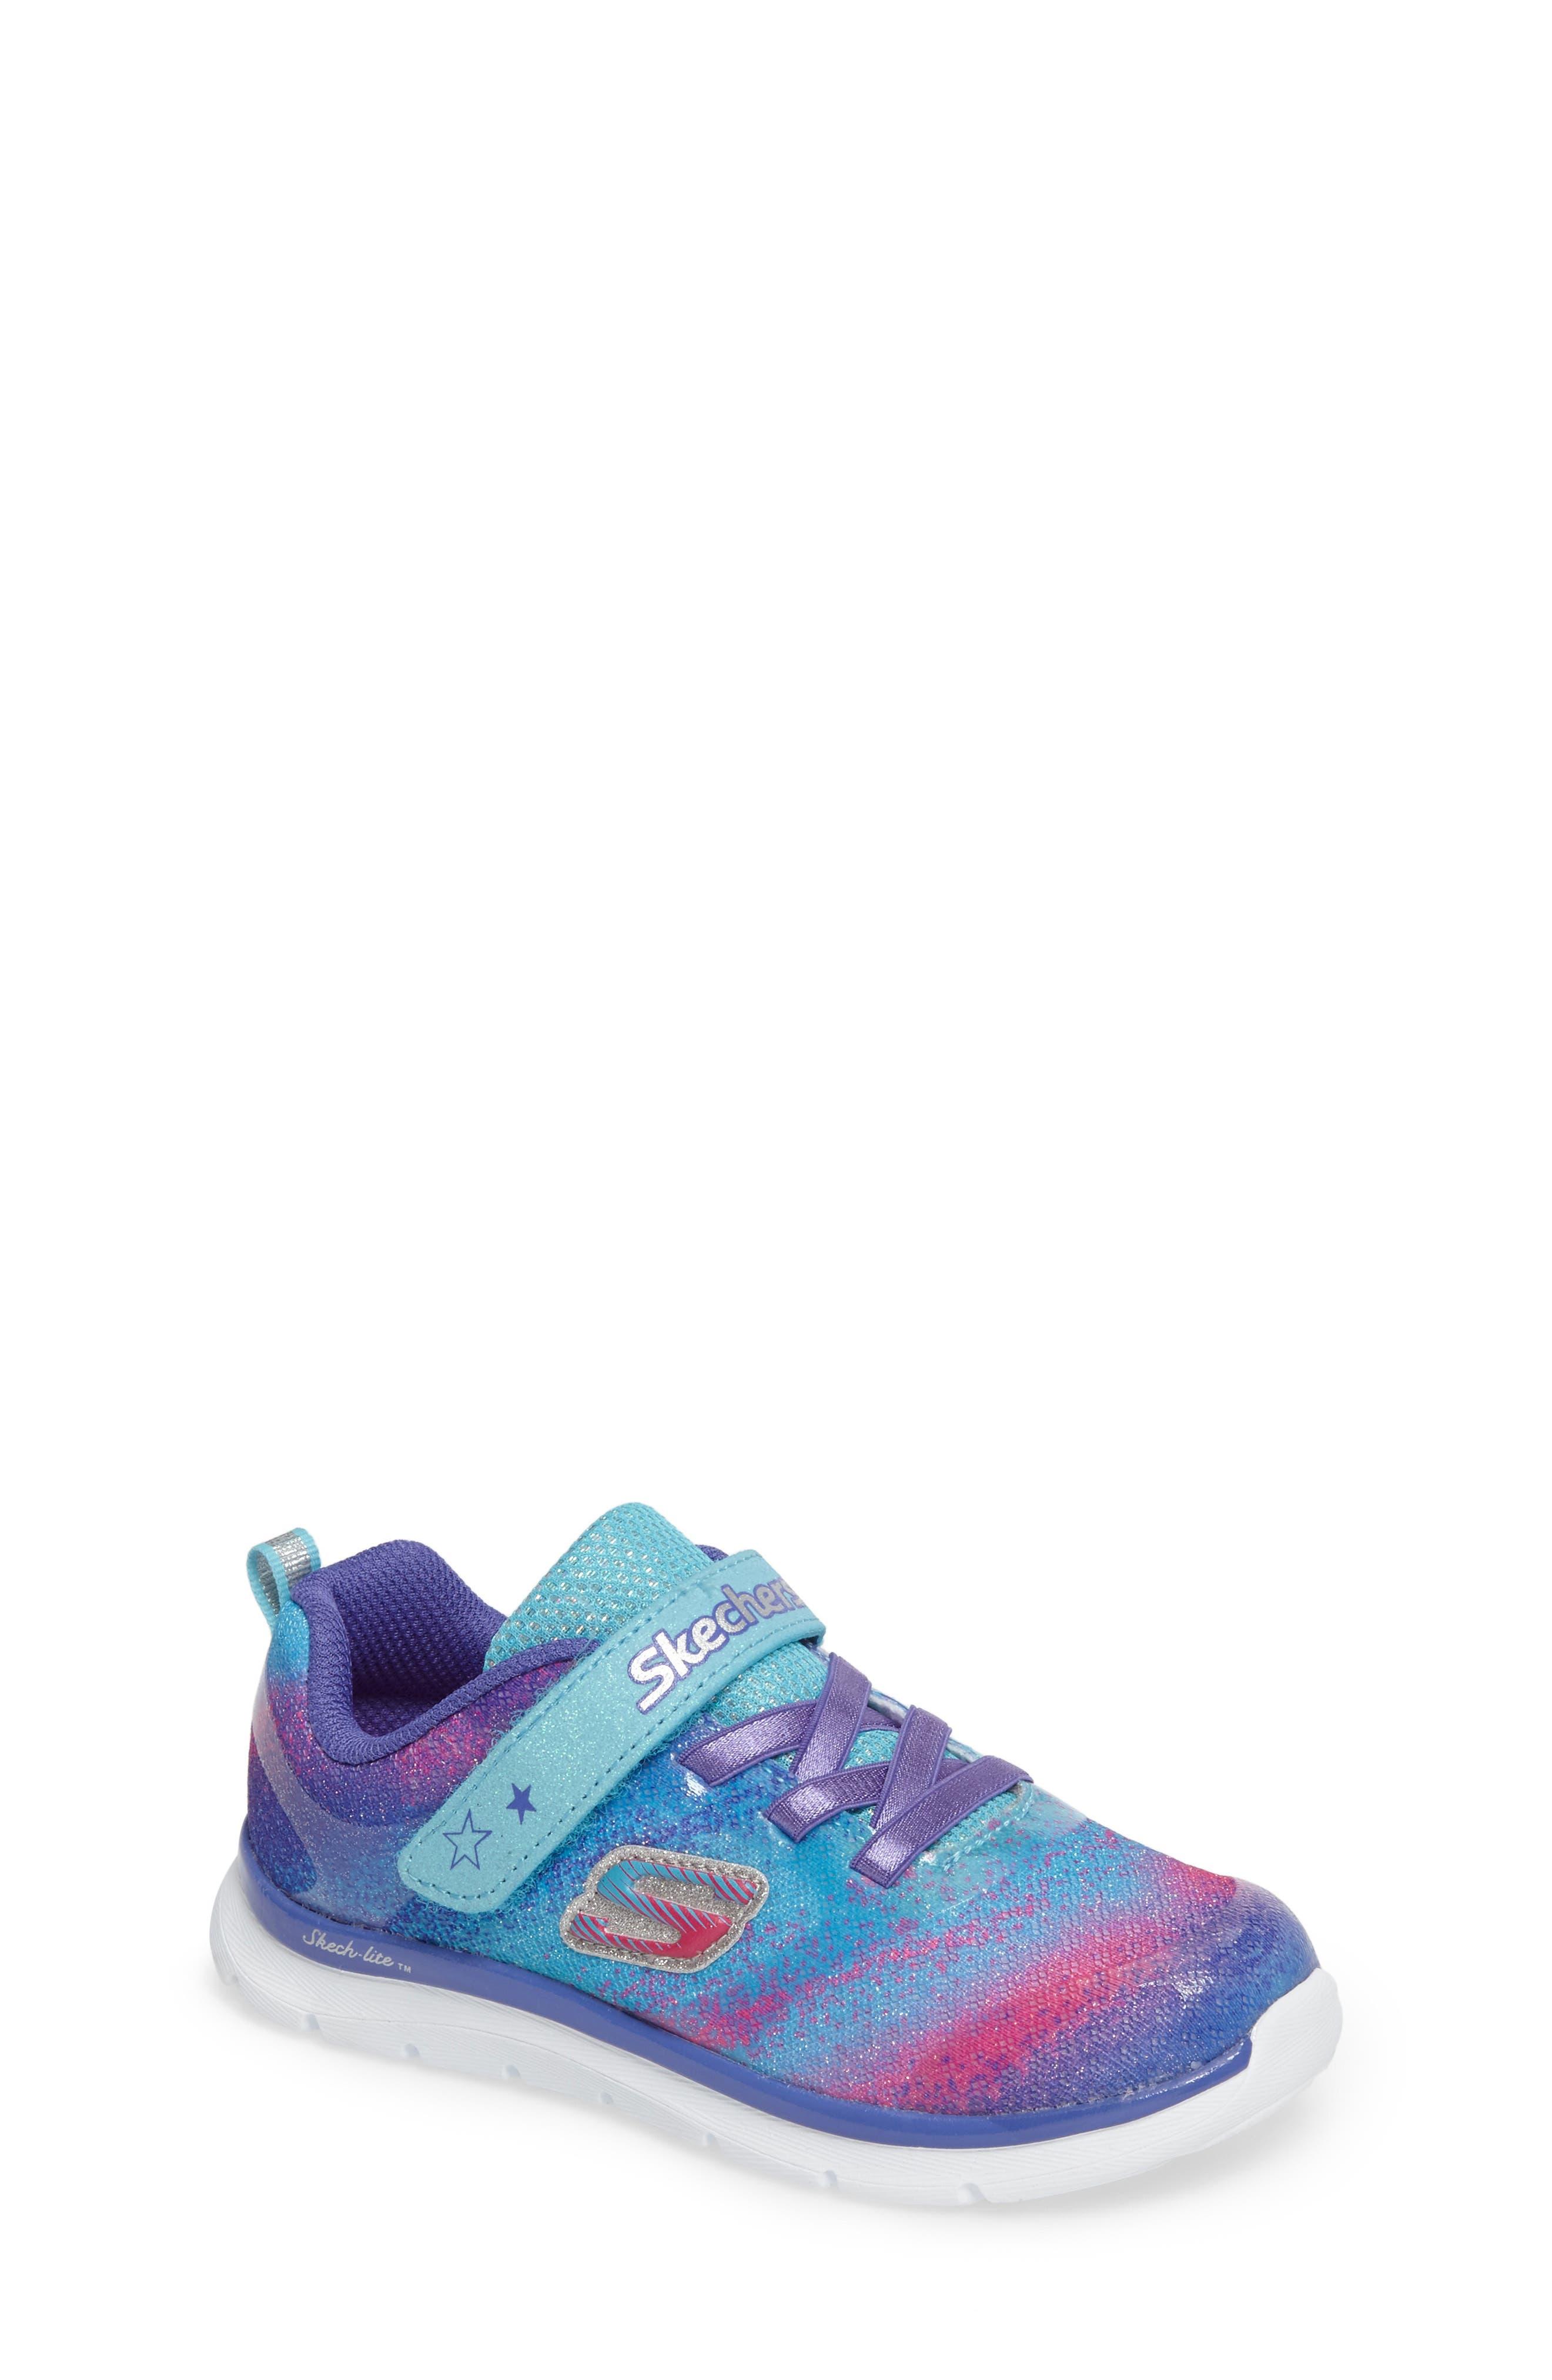 Main Image - SKECHERS Skech-Lite Colorful Cutie Sneaker (Walker & Toddler)